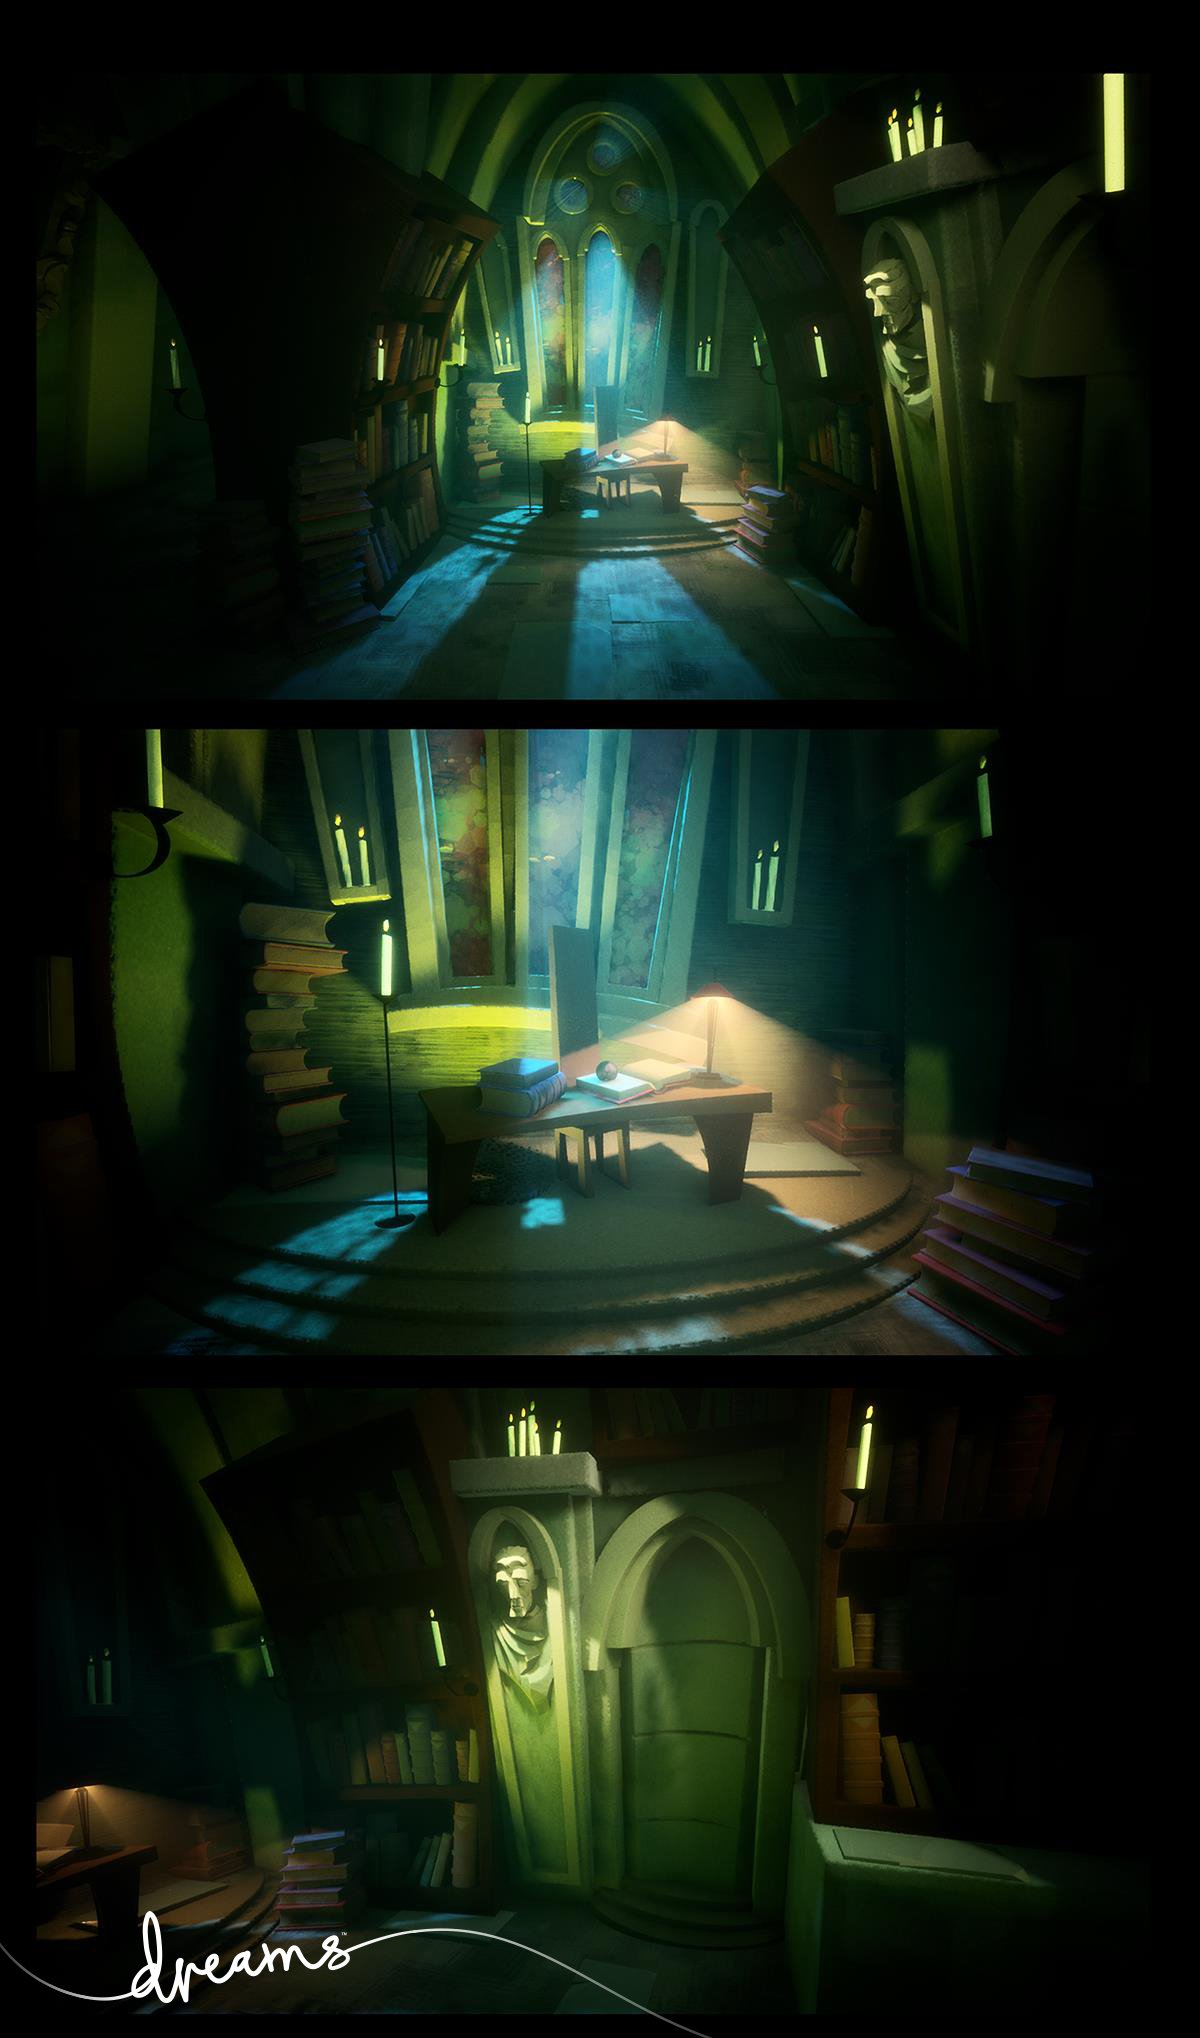 Novas imagens de dreams exclusivo de playstation 4 for Dreamhome com